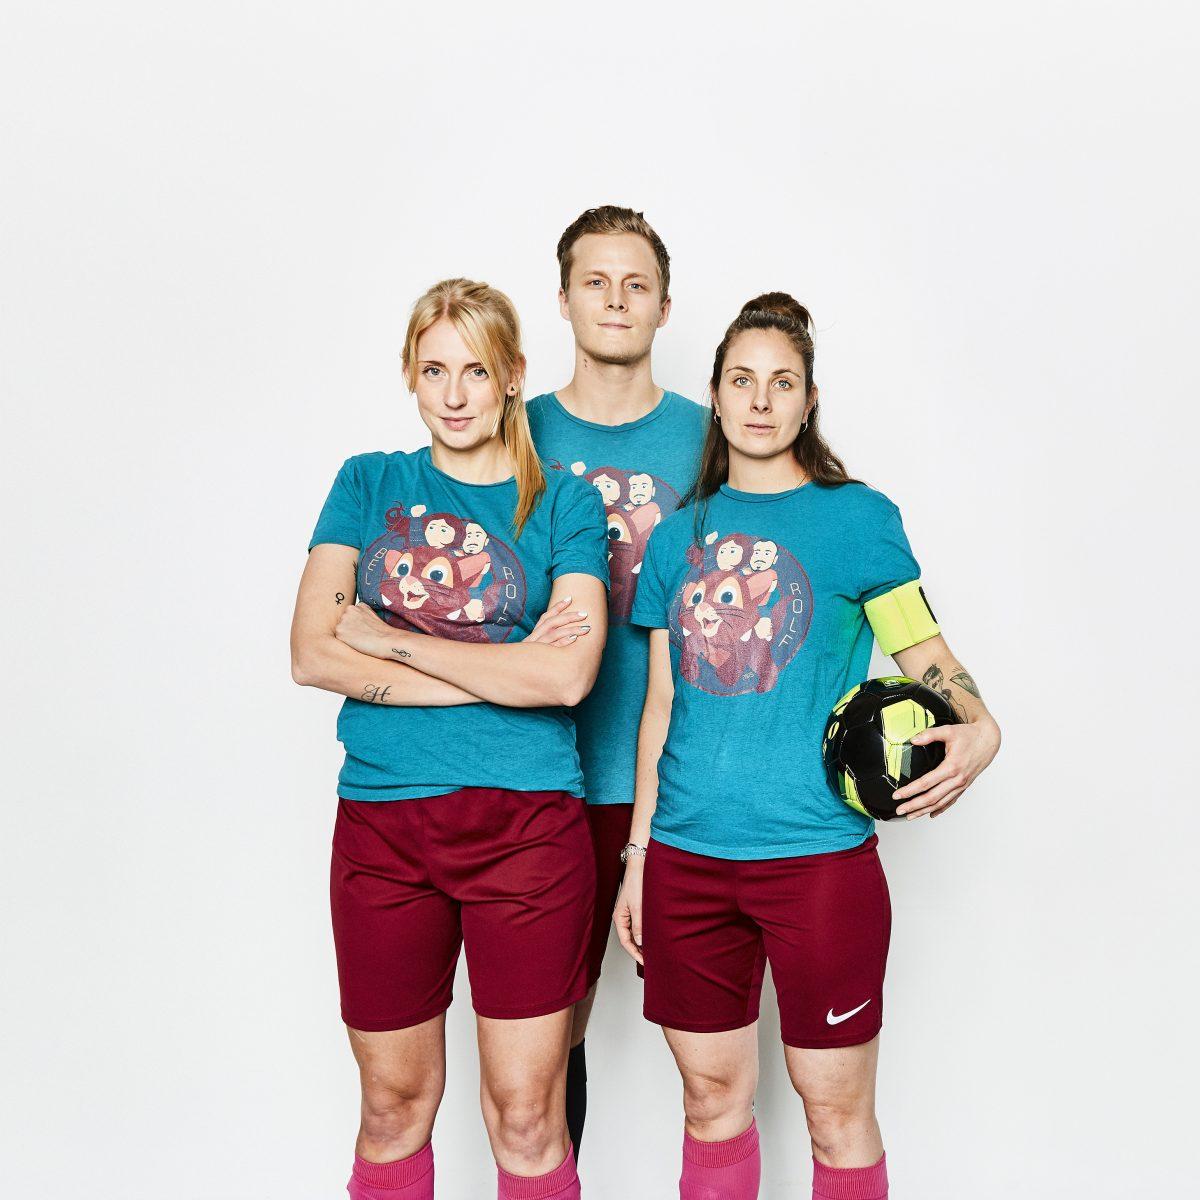 3 fotballspelare